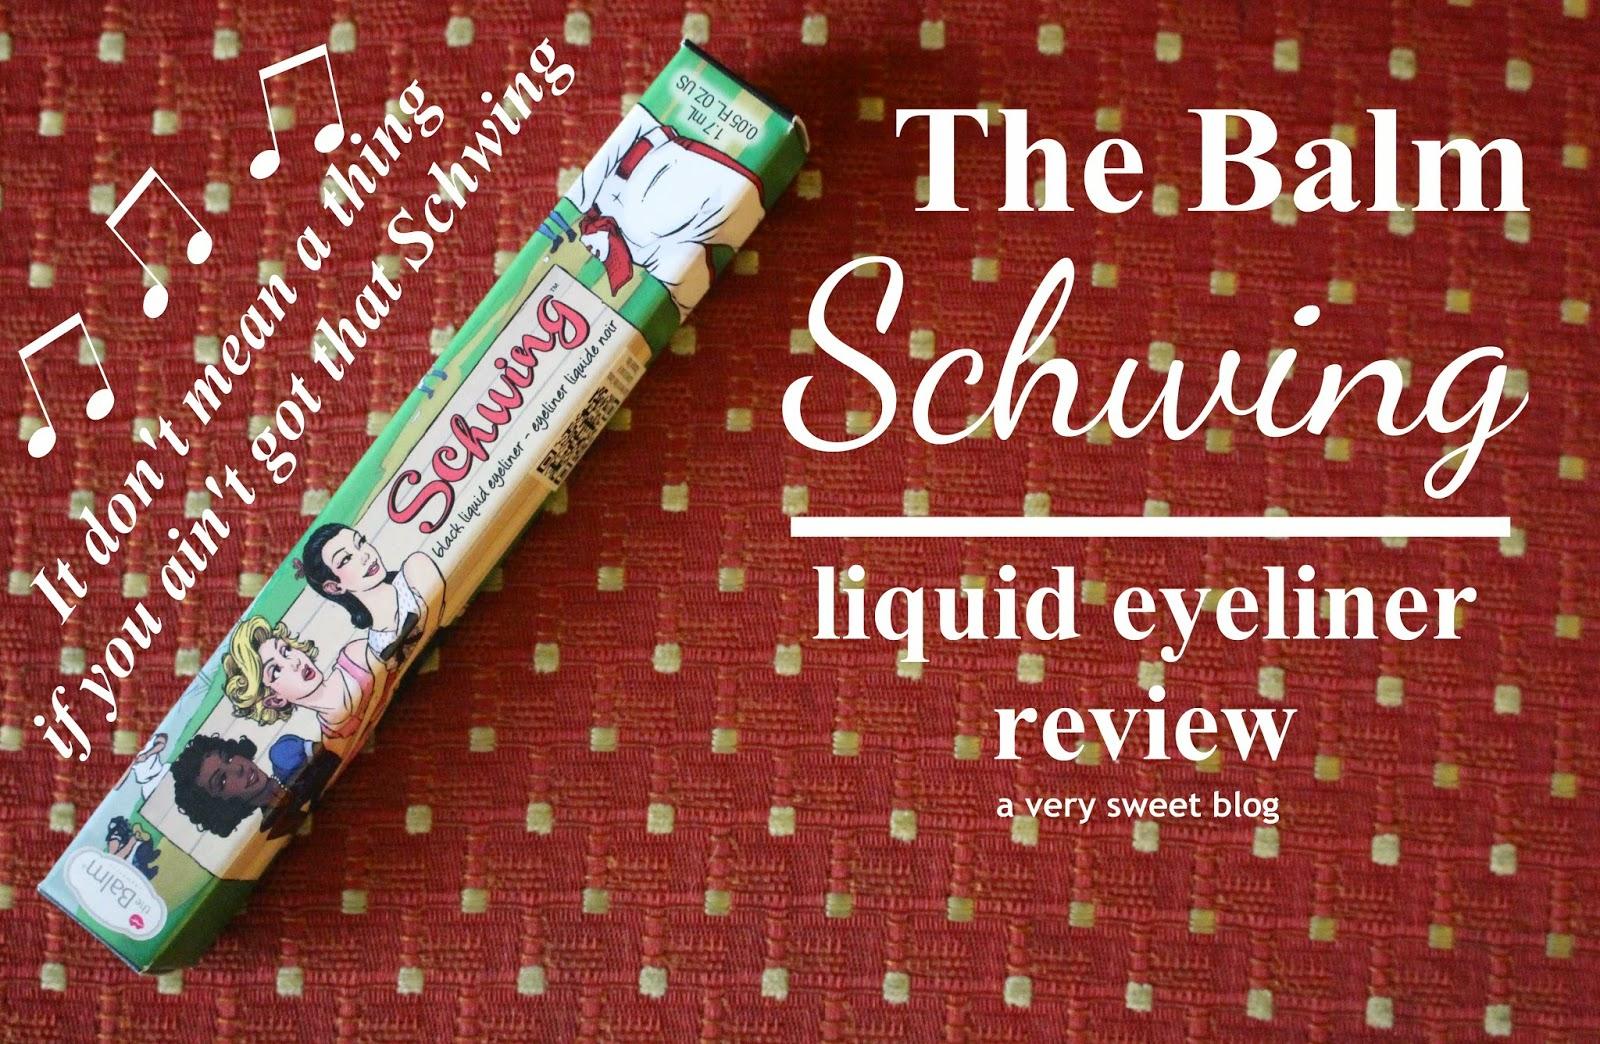 Schwing Liquid Eyeliner by theBalm #22